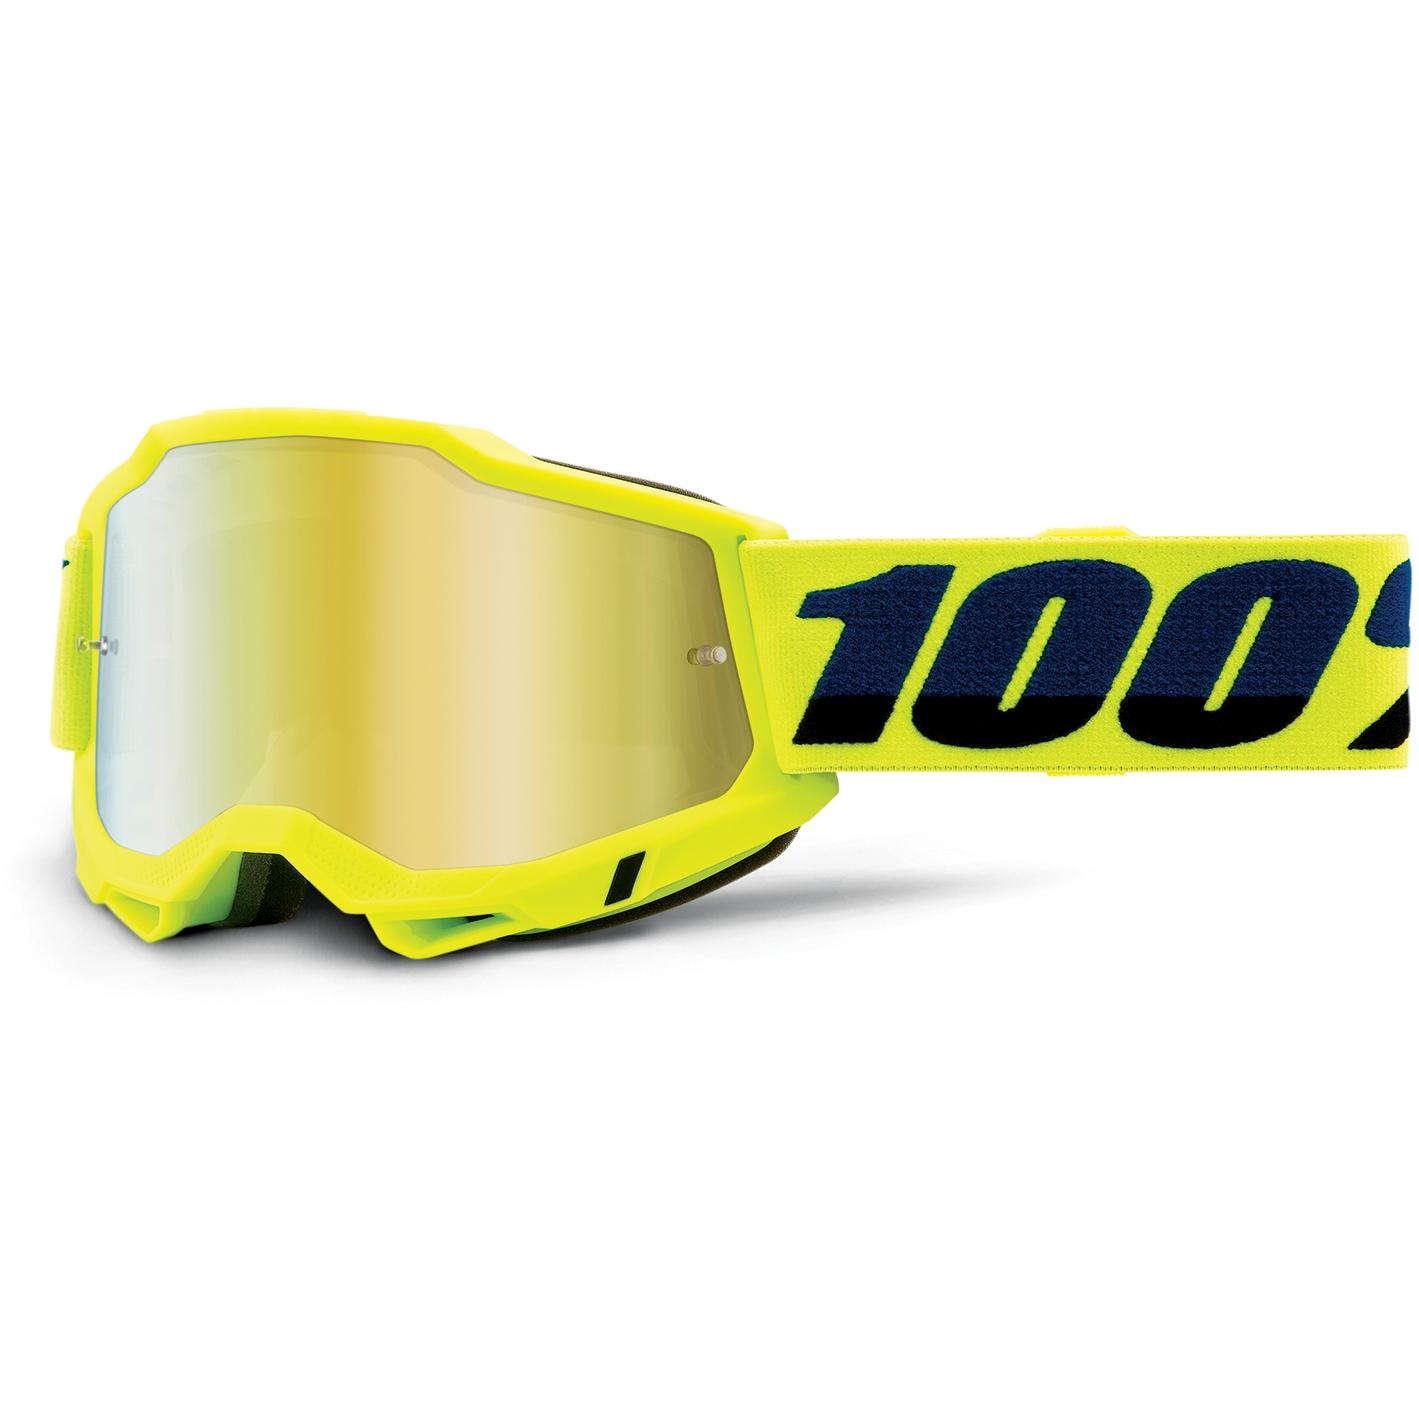 100% Accuri 2 Goggle Mirror Lens Gafas - Fluo Yellow